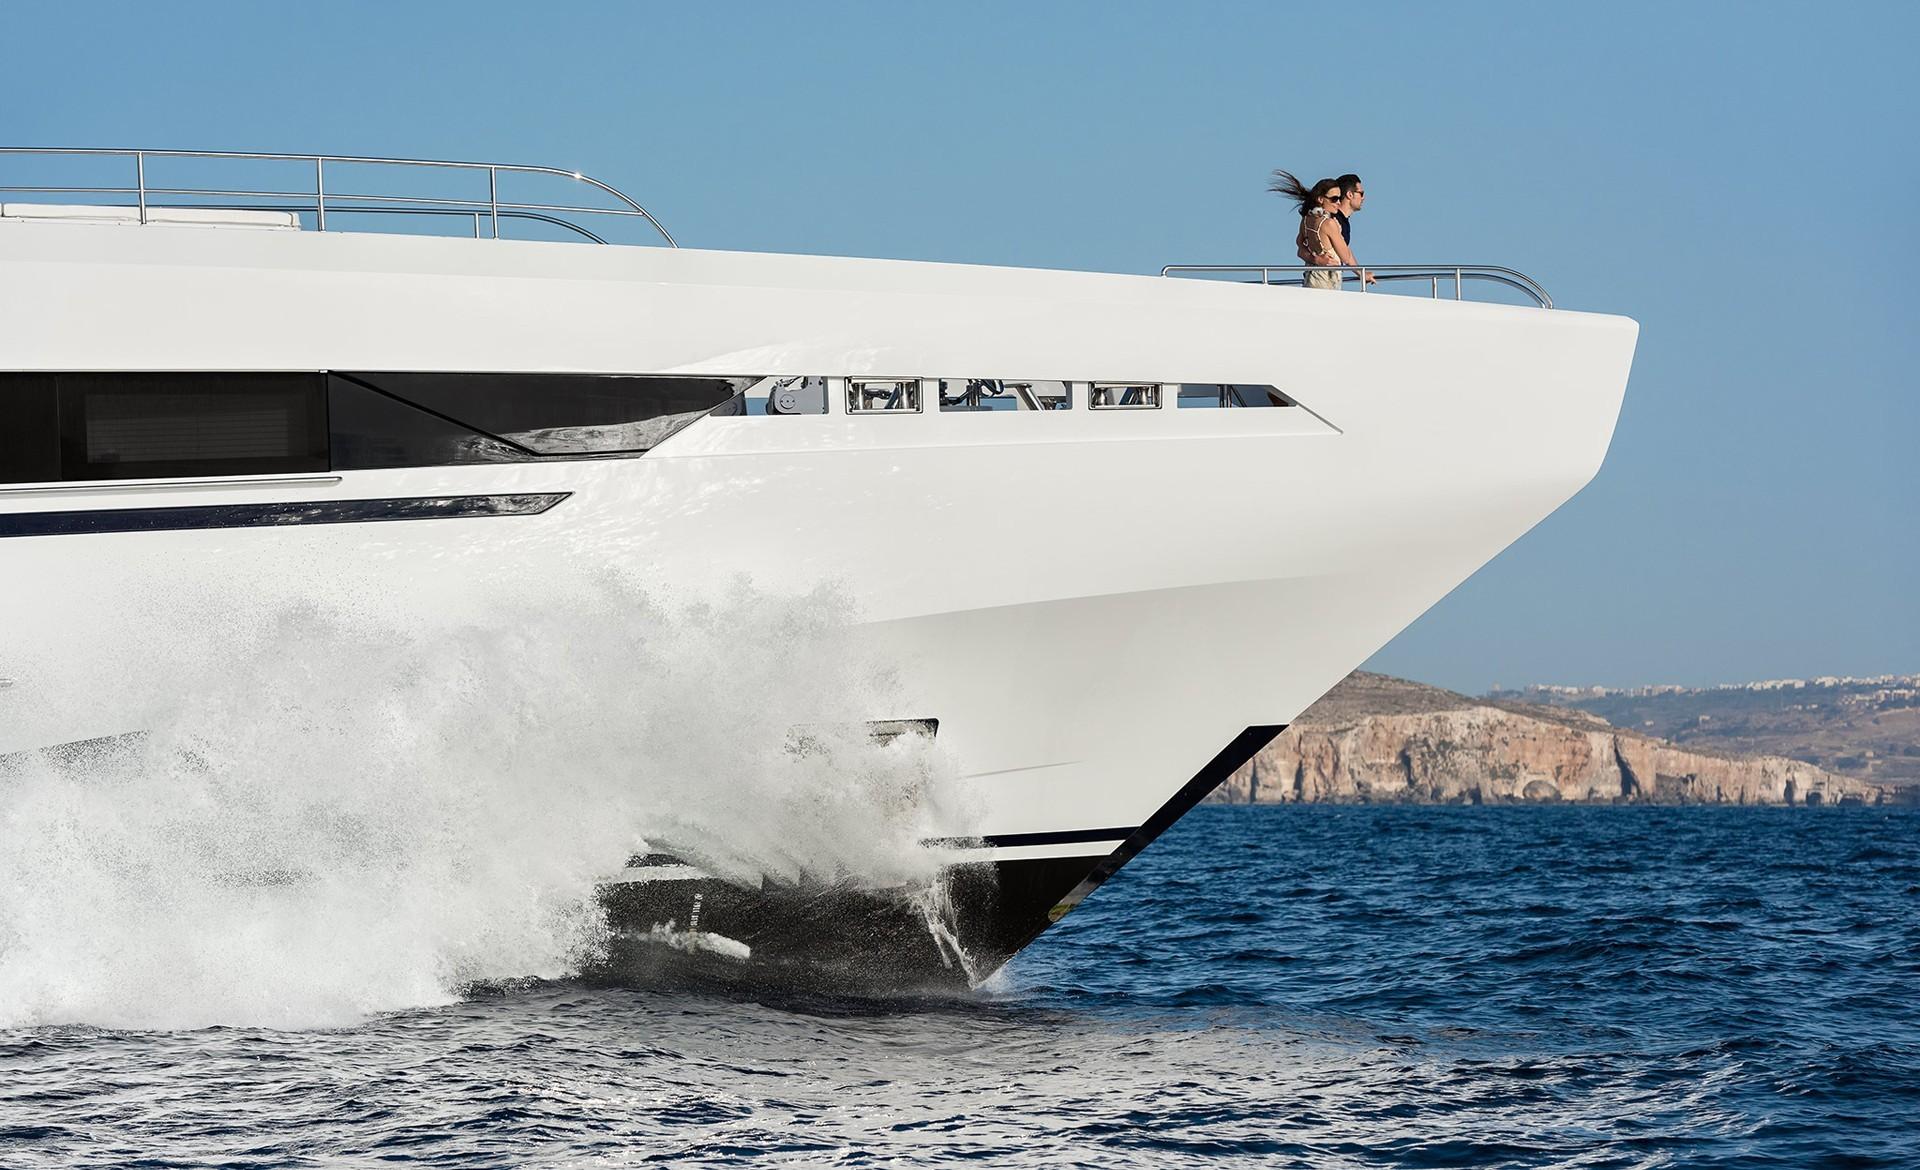 Amore-Mio-Heesen-Yachts-6-1920x1170.jpg